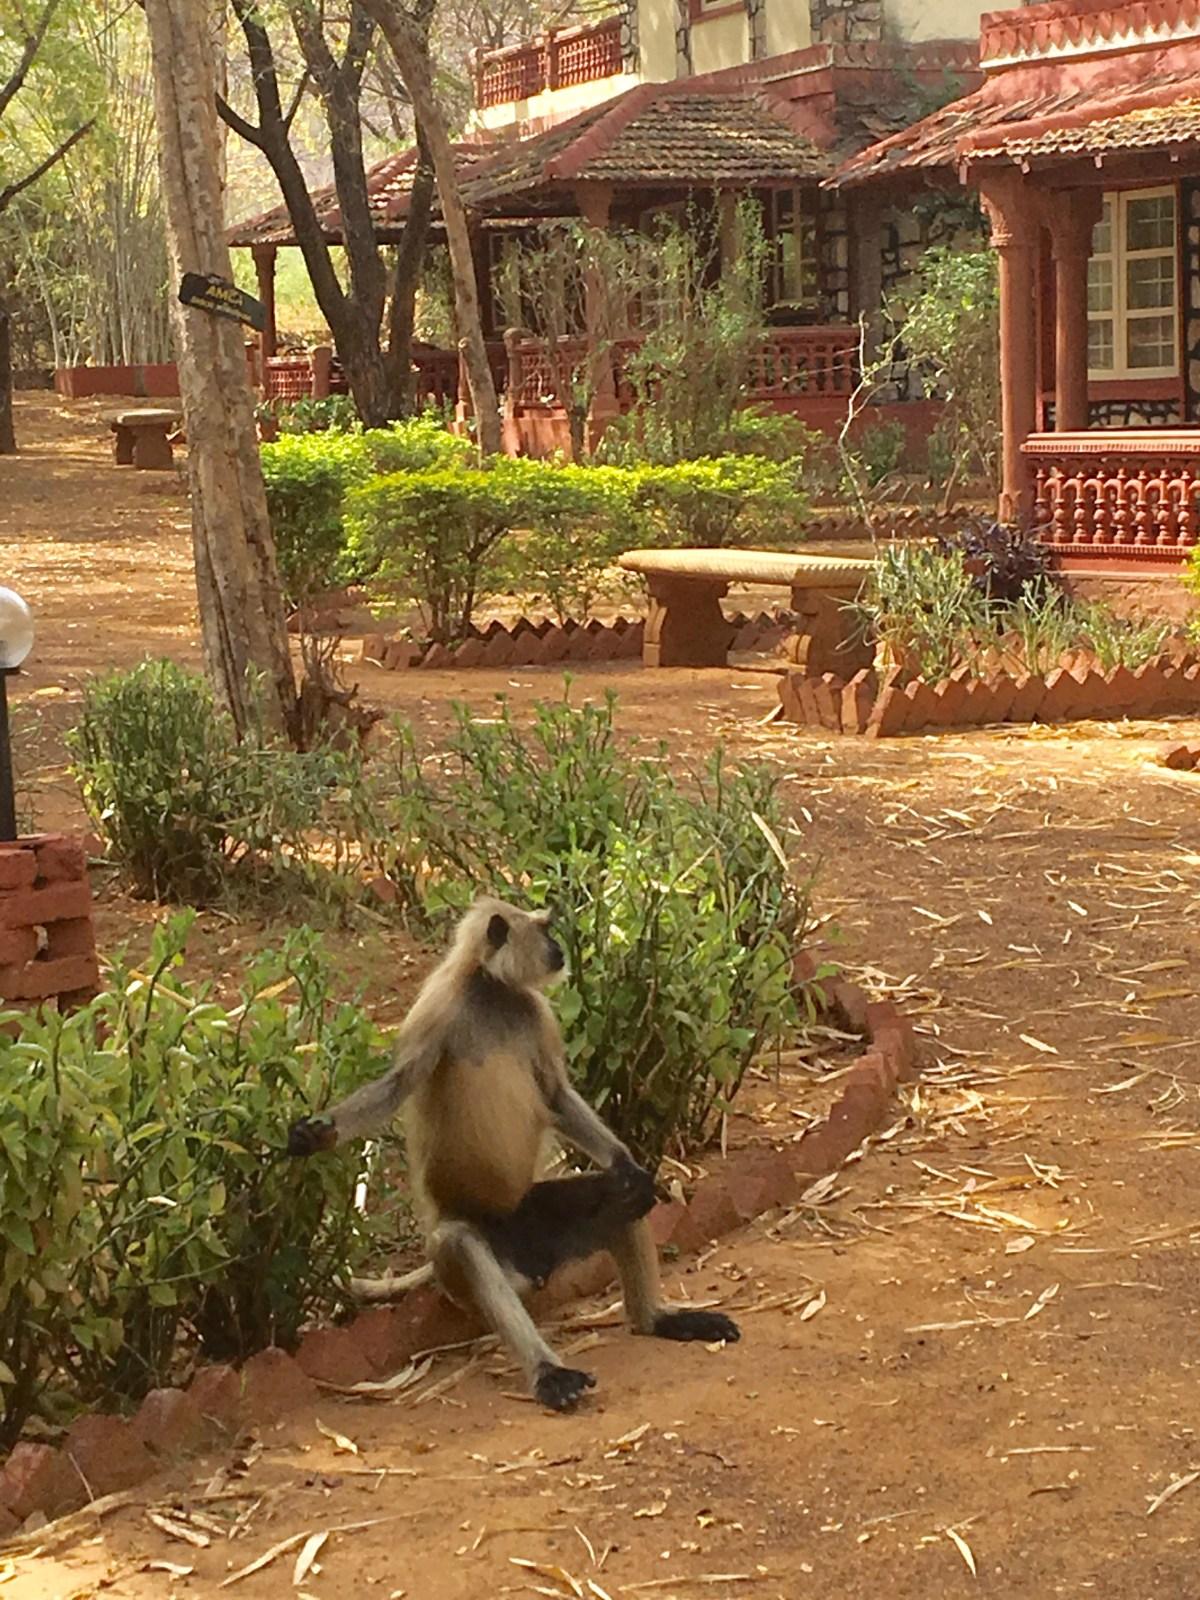 Our resort at Rathambore